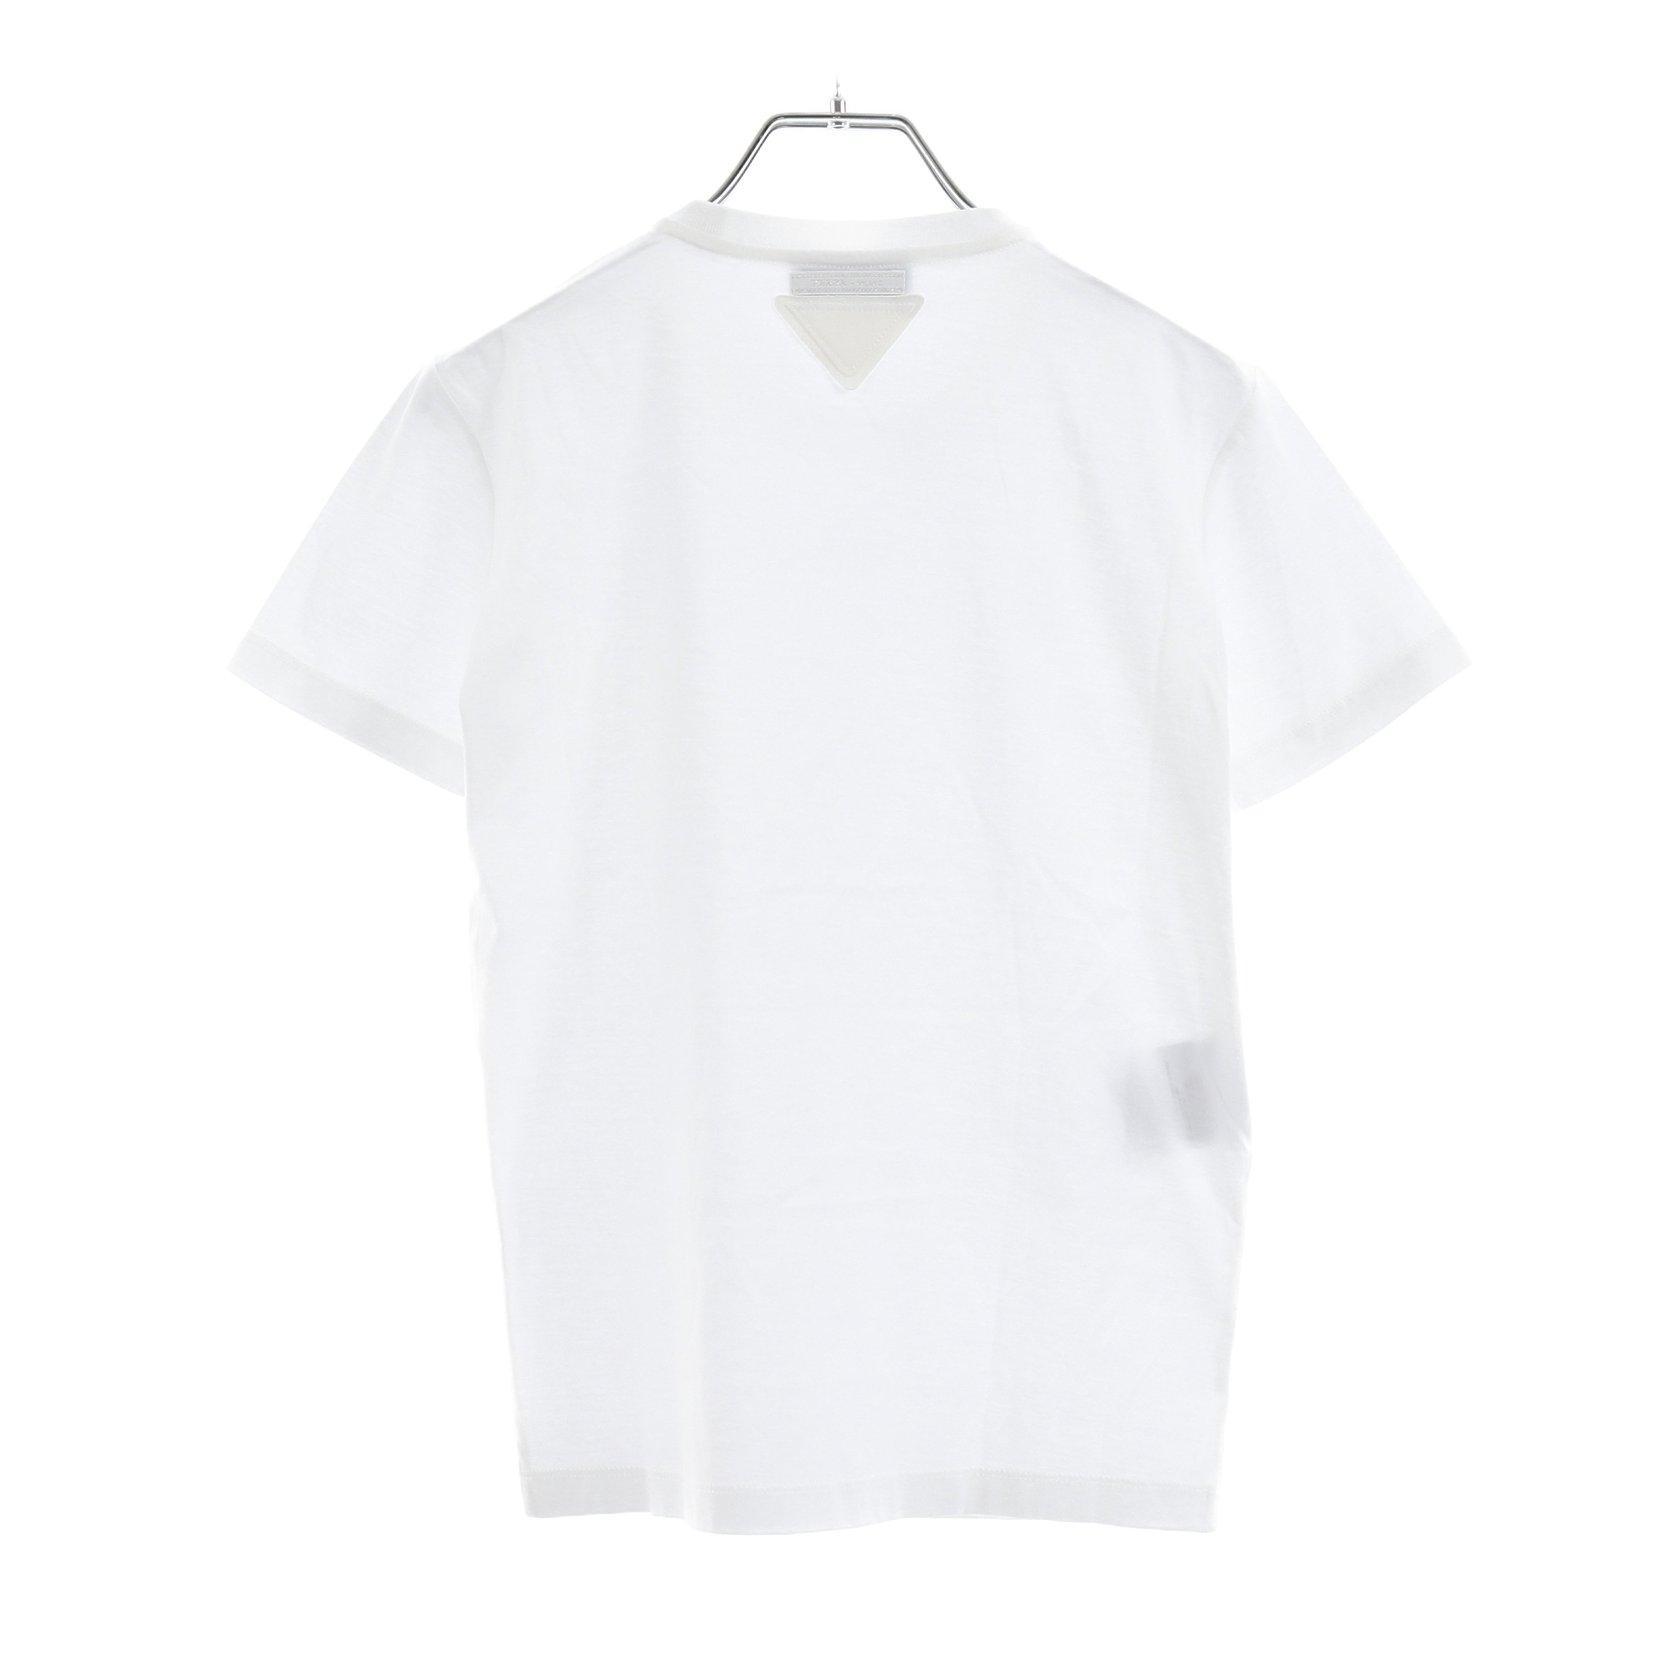 PRADA・トップス・ Tシャツ カットソー ホワイト